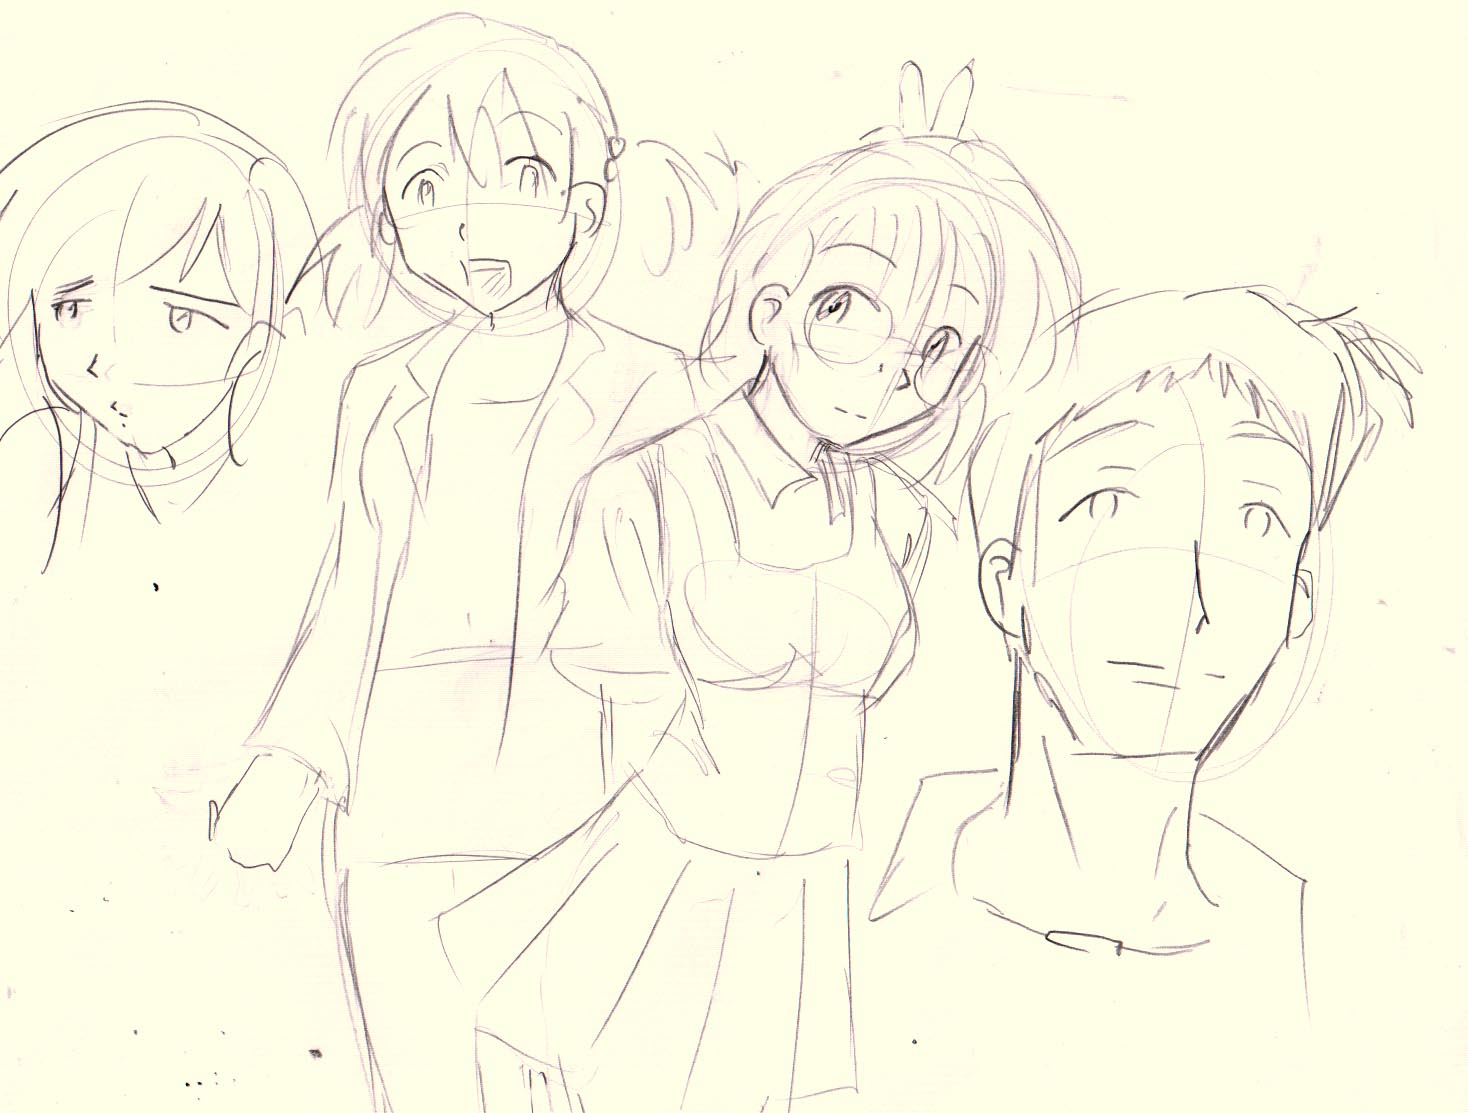 Manga Character Design Ideas : Anime character design ideas imgkid the image